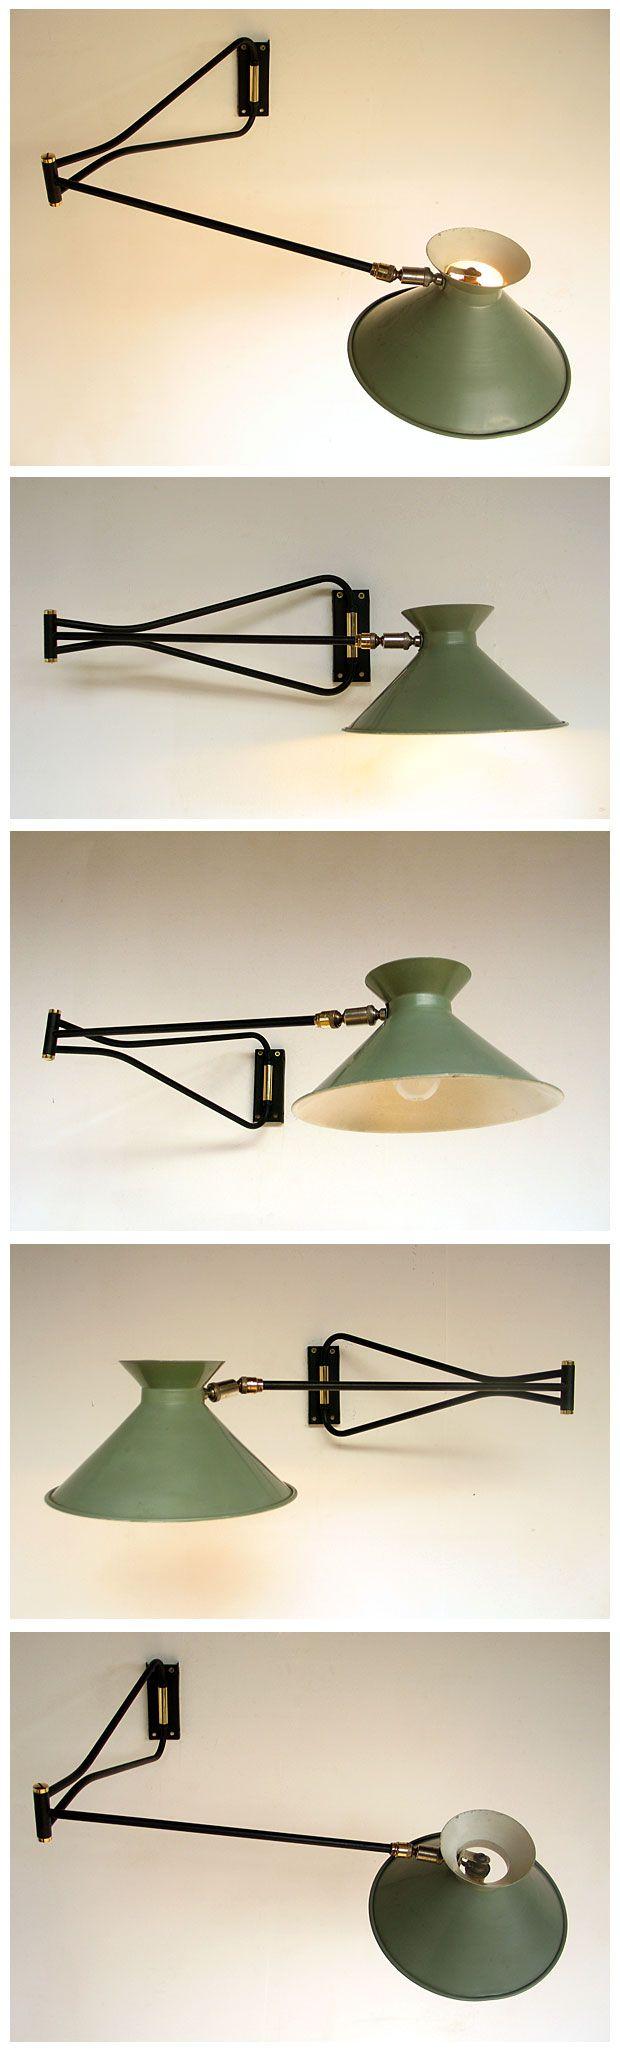 French industrial swing lamp Pierre Guariche 1950